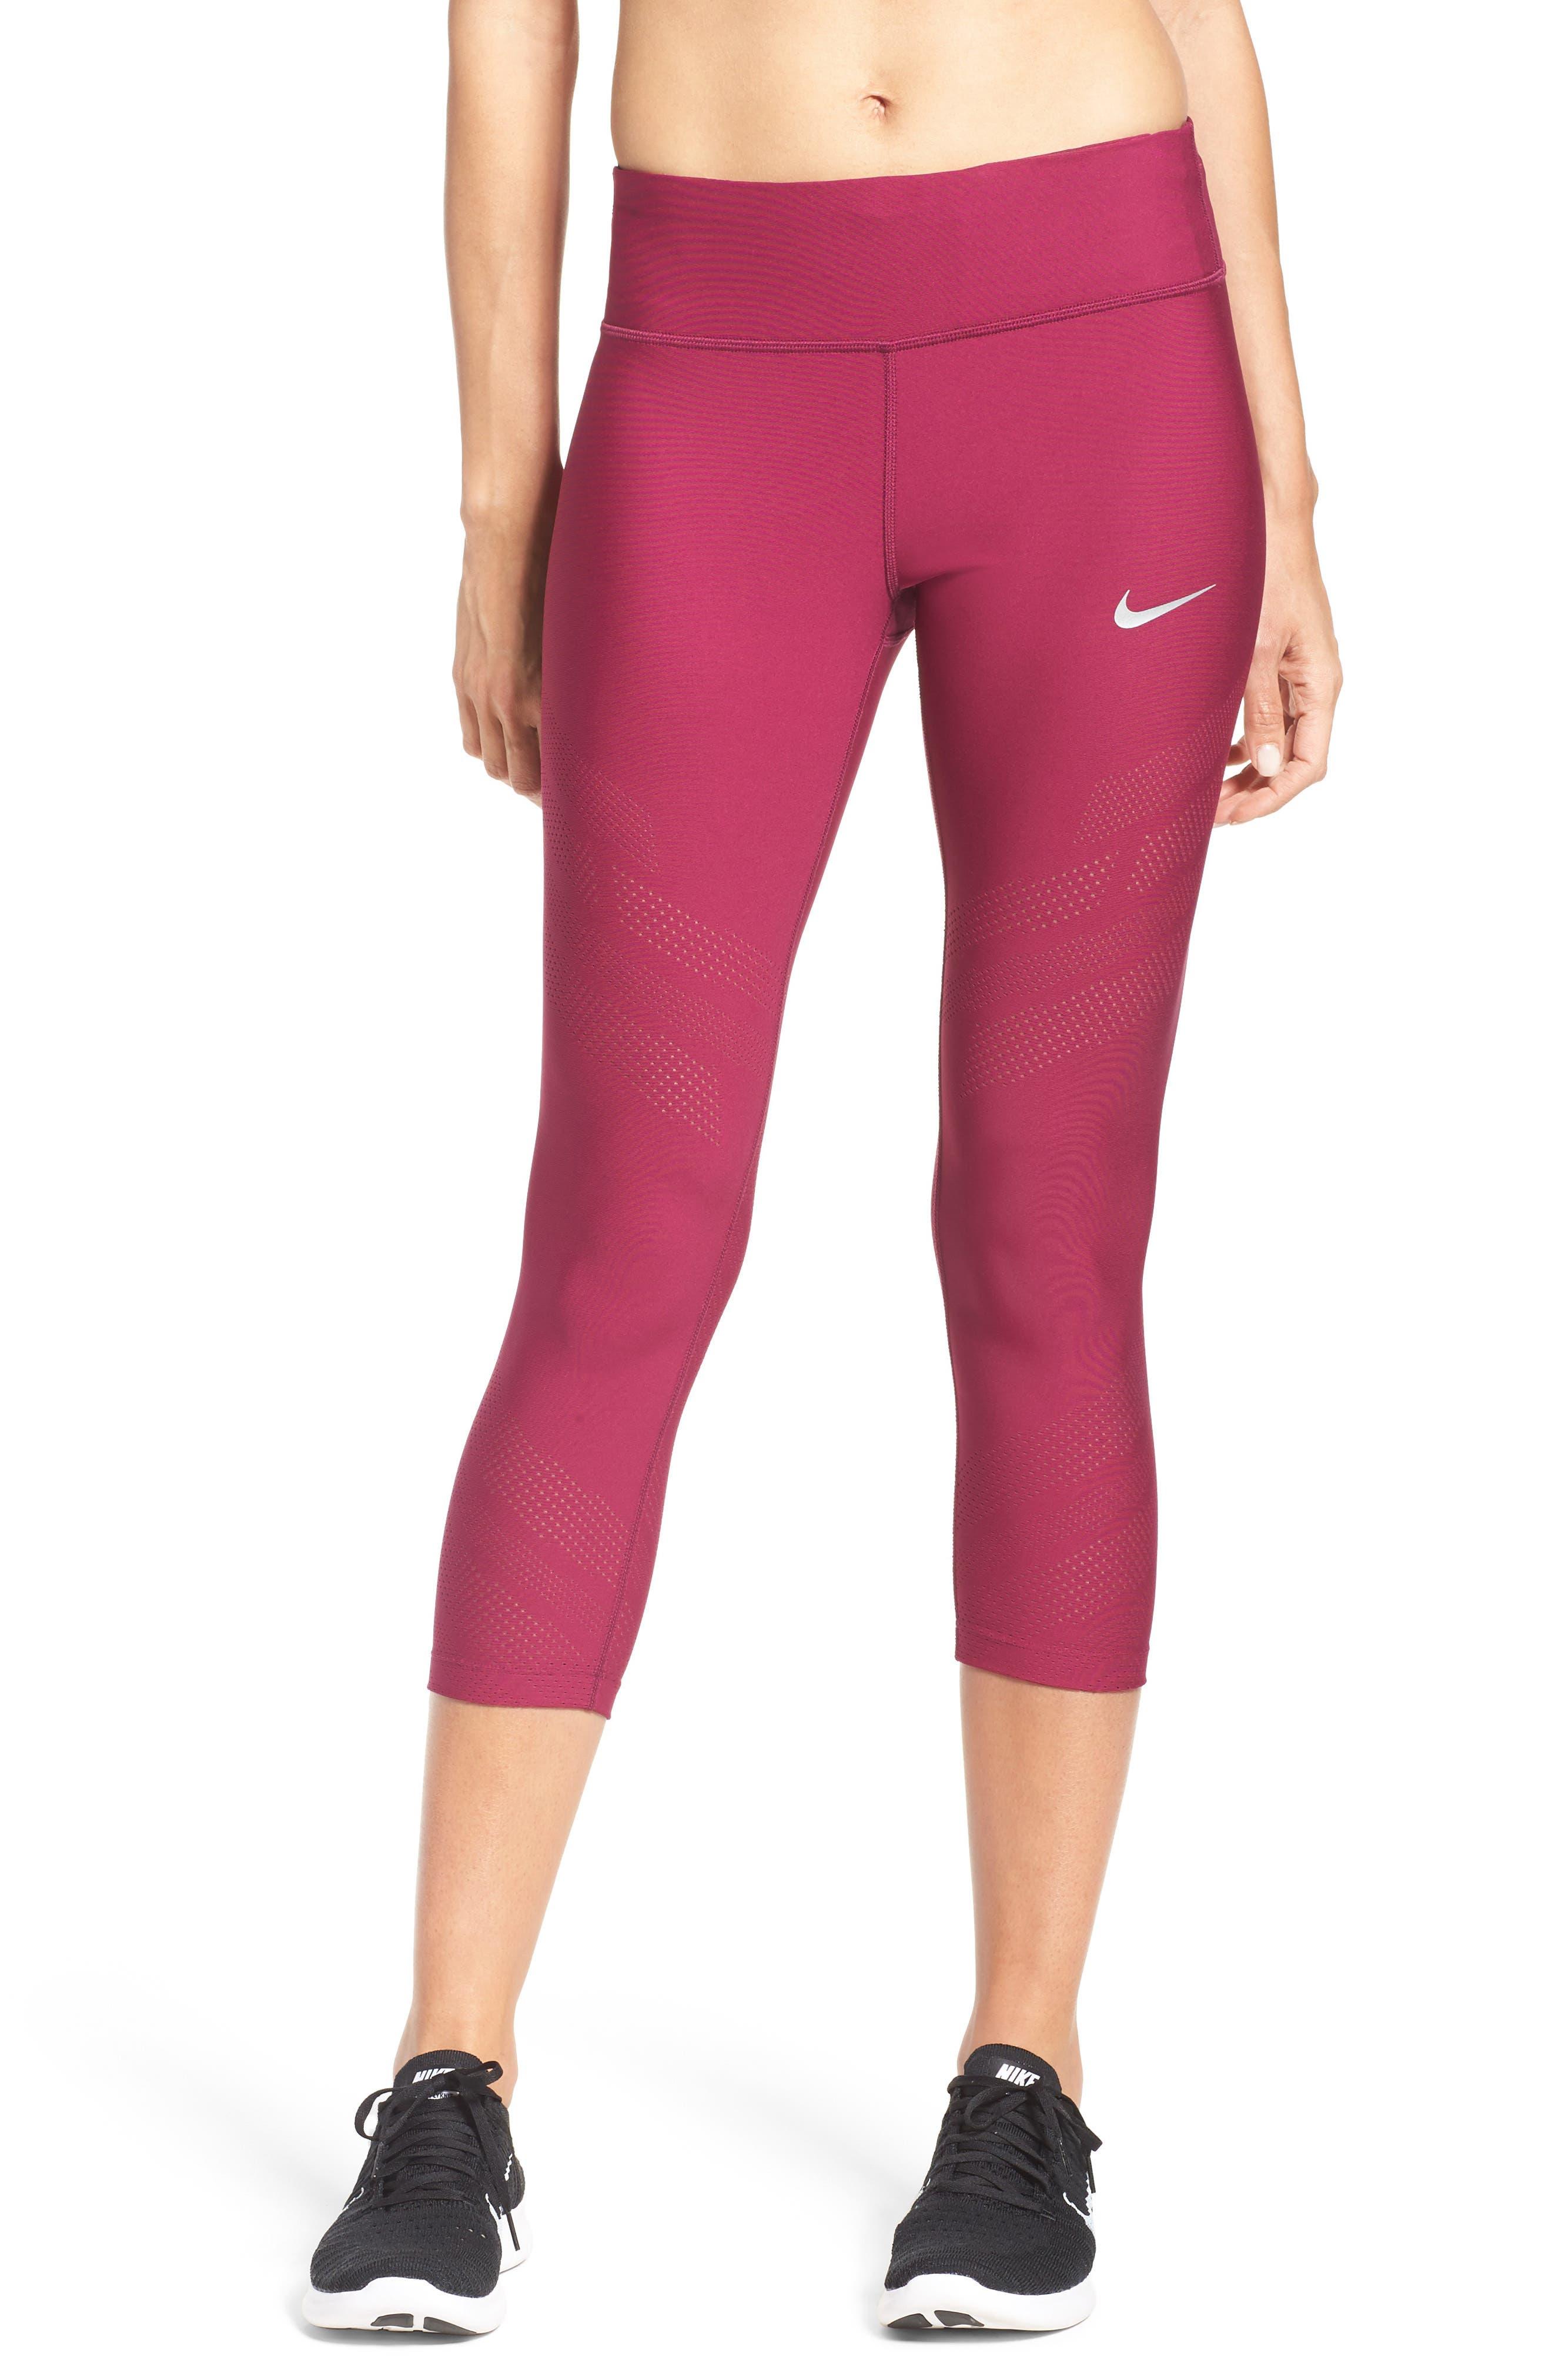 Nike Epic Cool Crop Running Tights